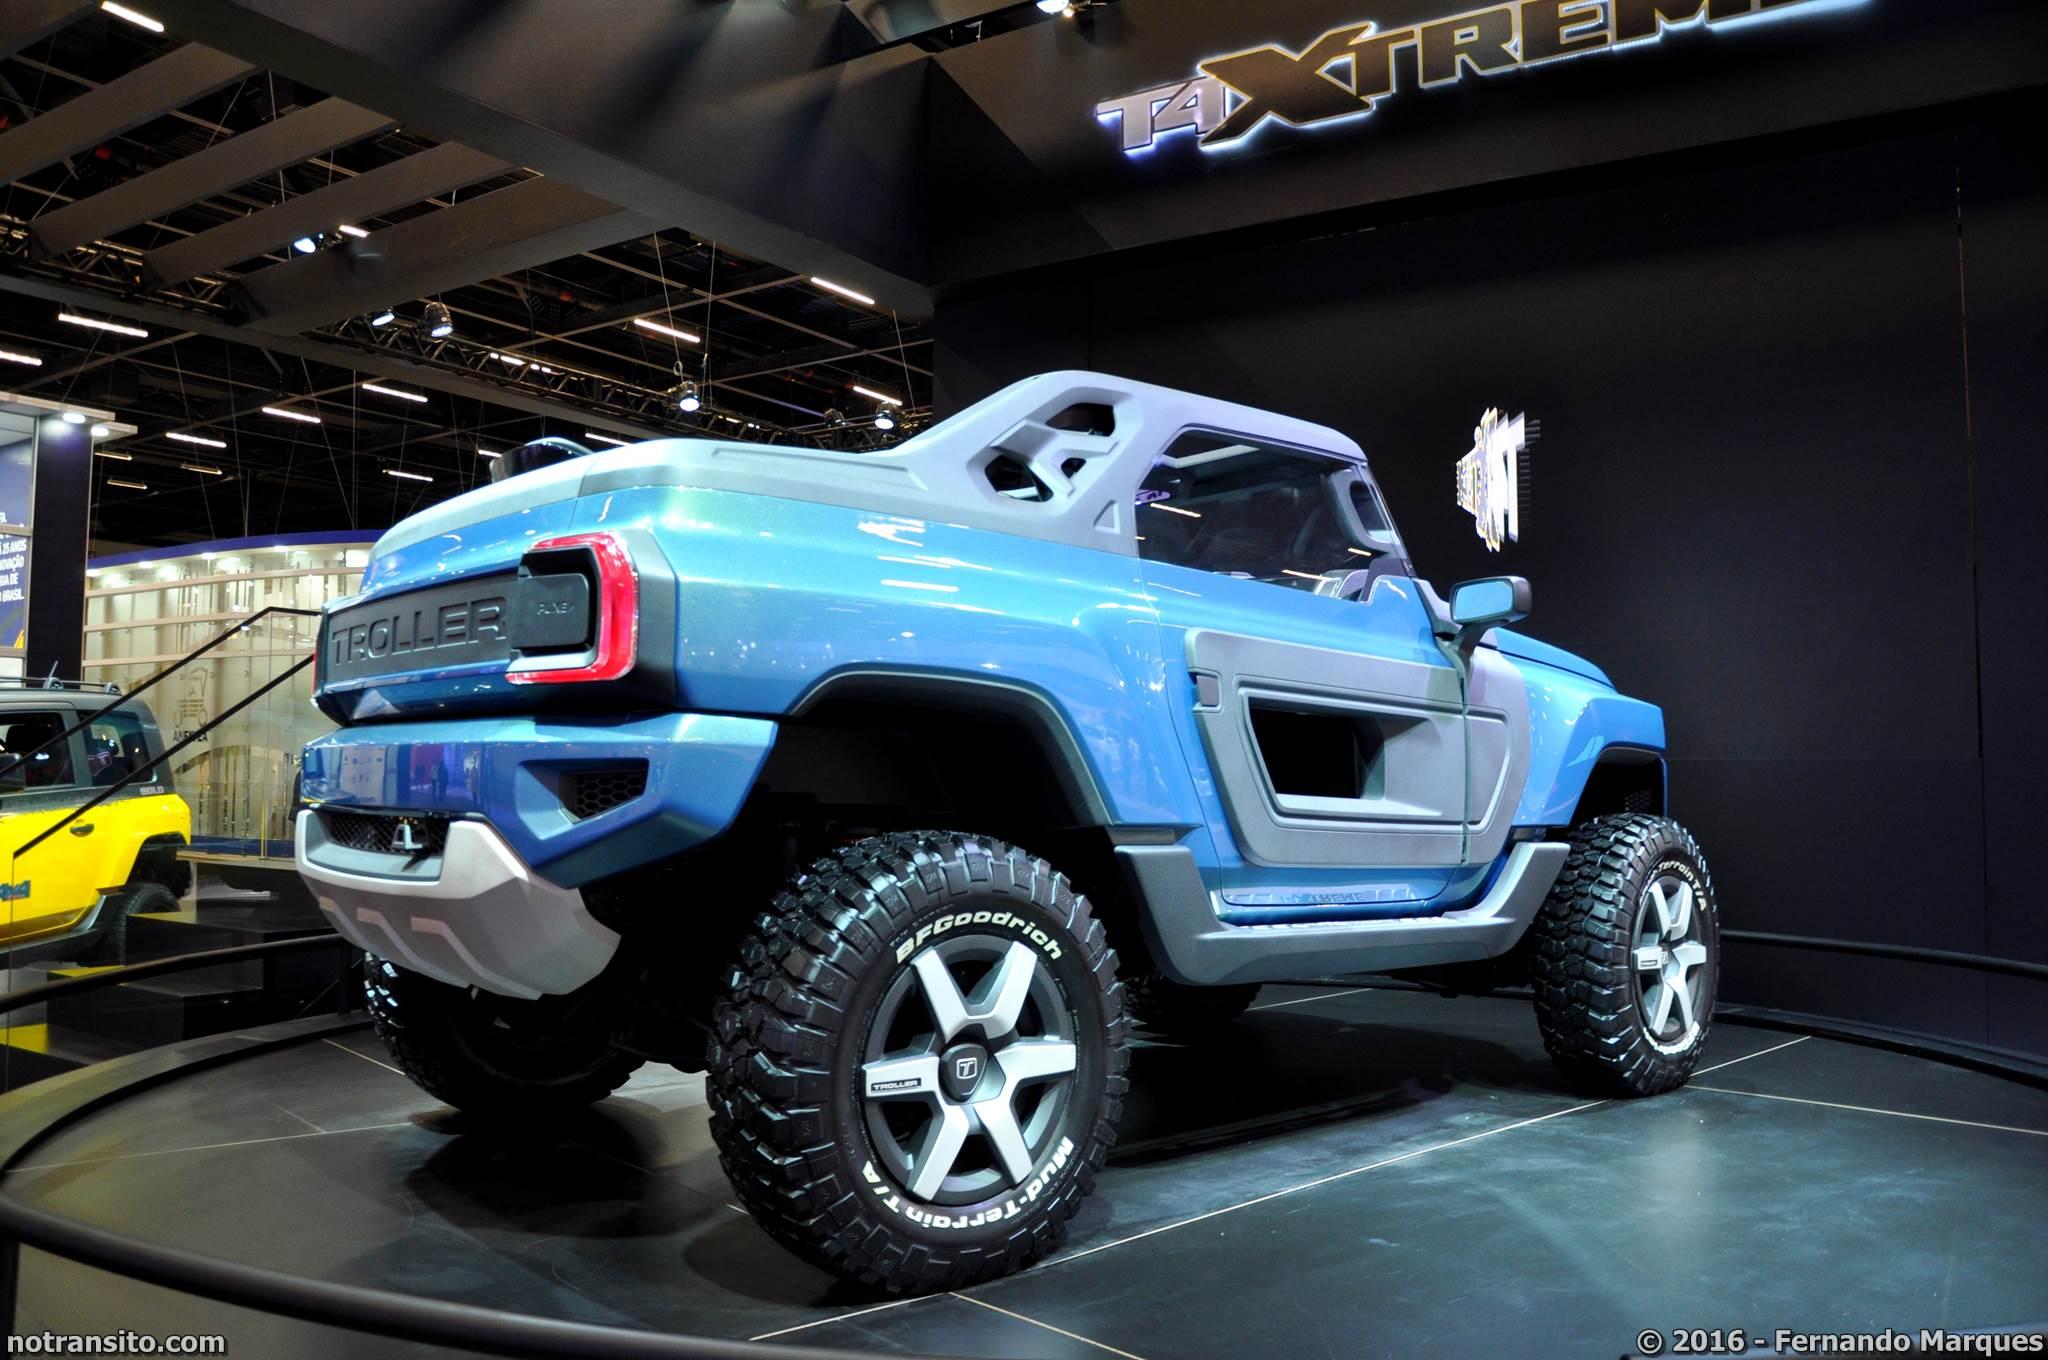 Troller T4 Xtreme Concept, Salão do Automóvel 2016